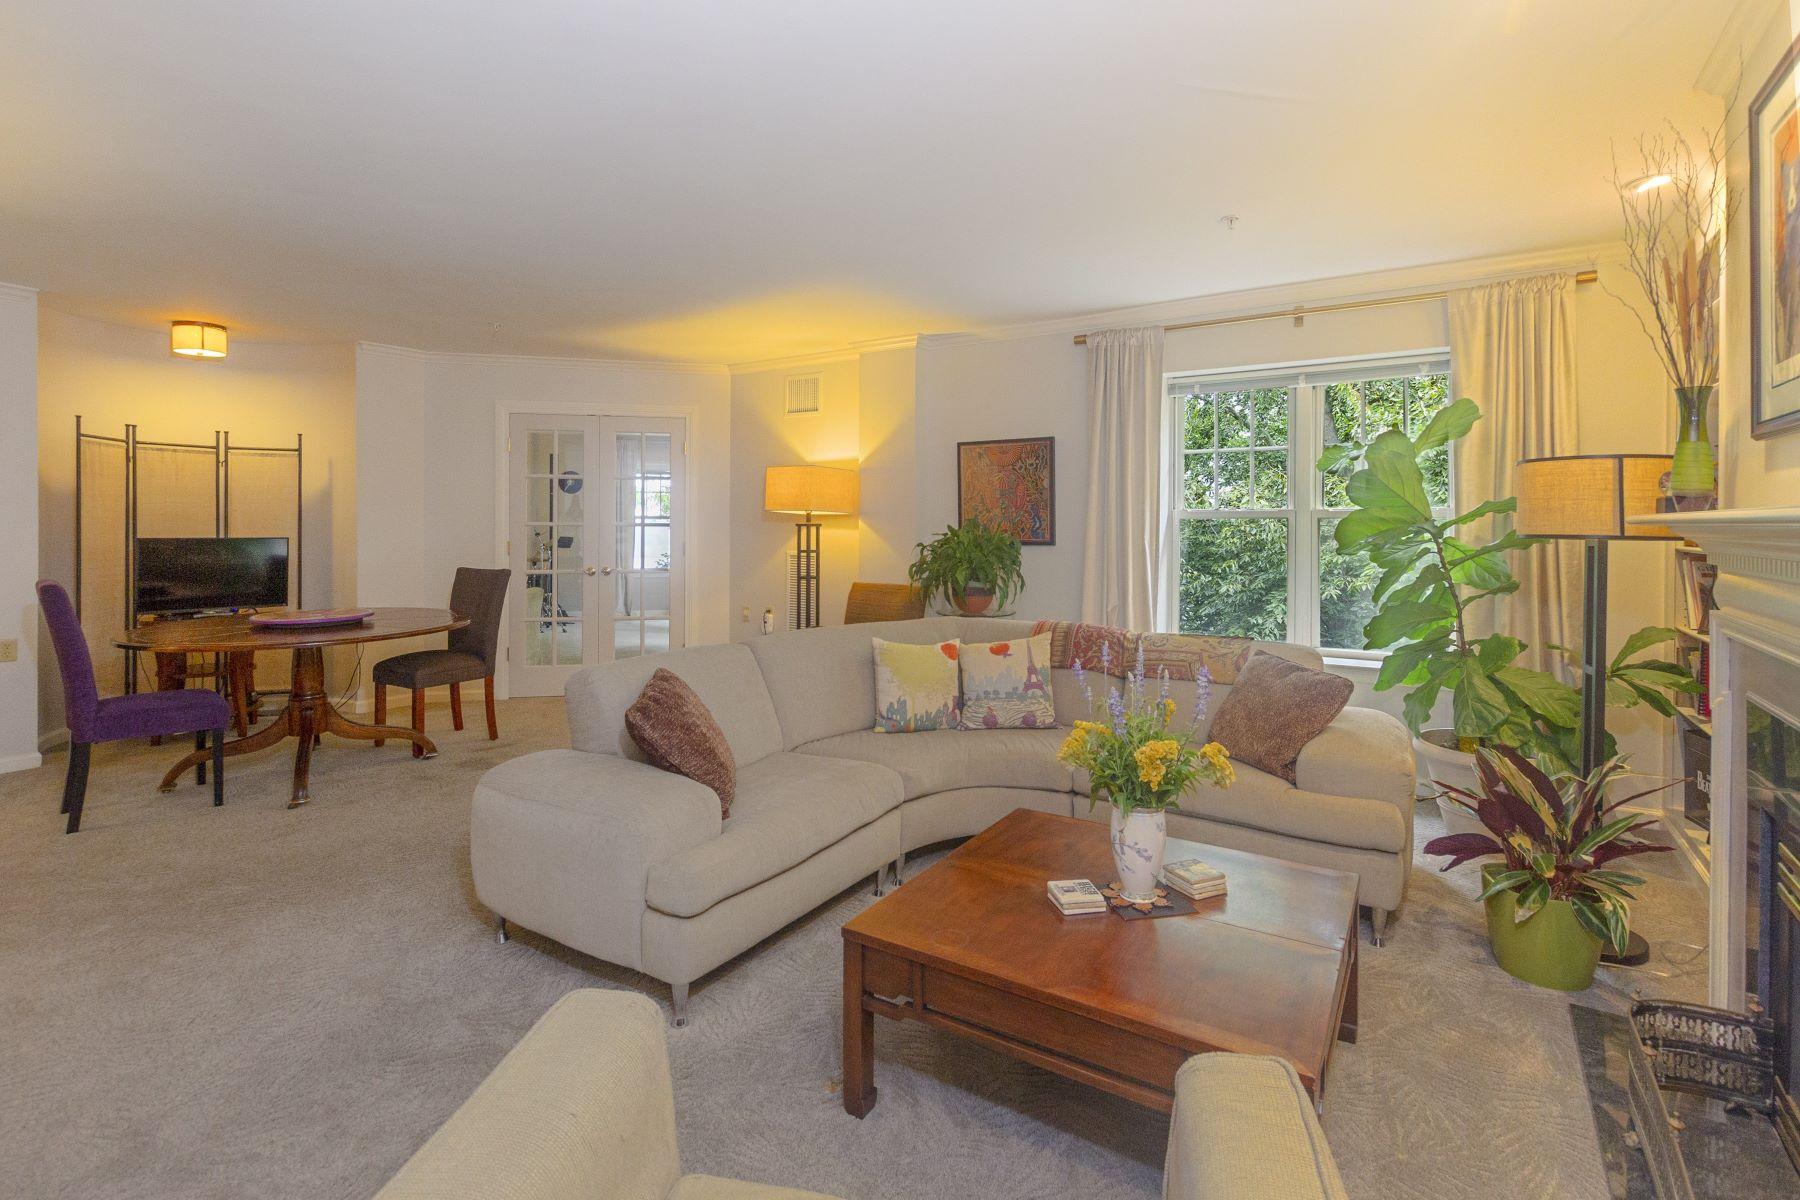 Condominiums for Sale at 355 Blackstone Boulevard, #401, East Side Of Providence, RI 355 Blackstone Boulevard, 401, Providence, Rhode Island 02906 United States